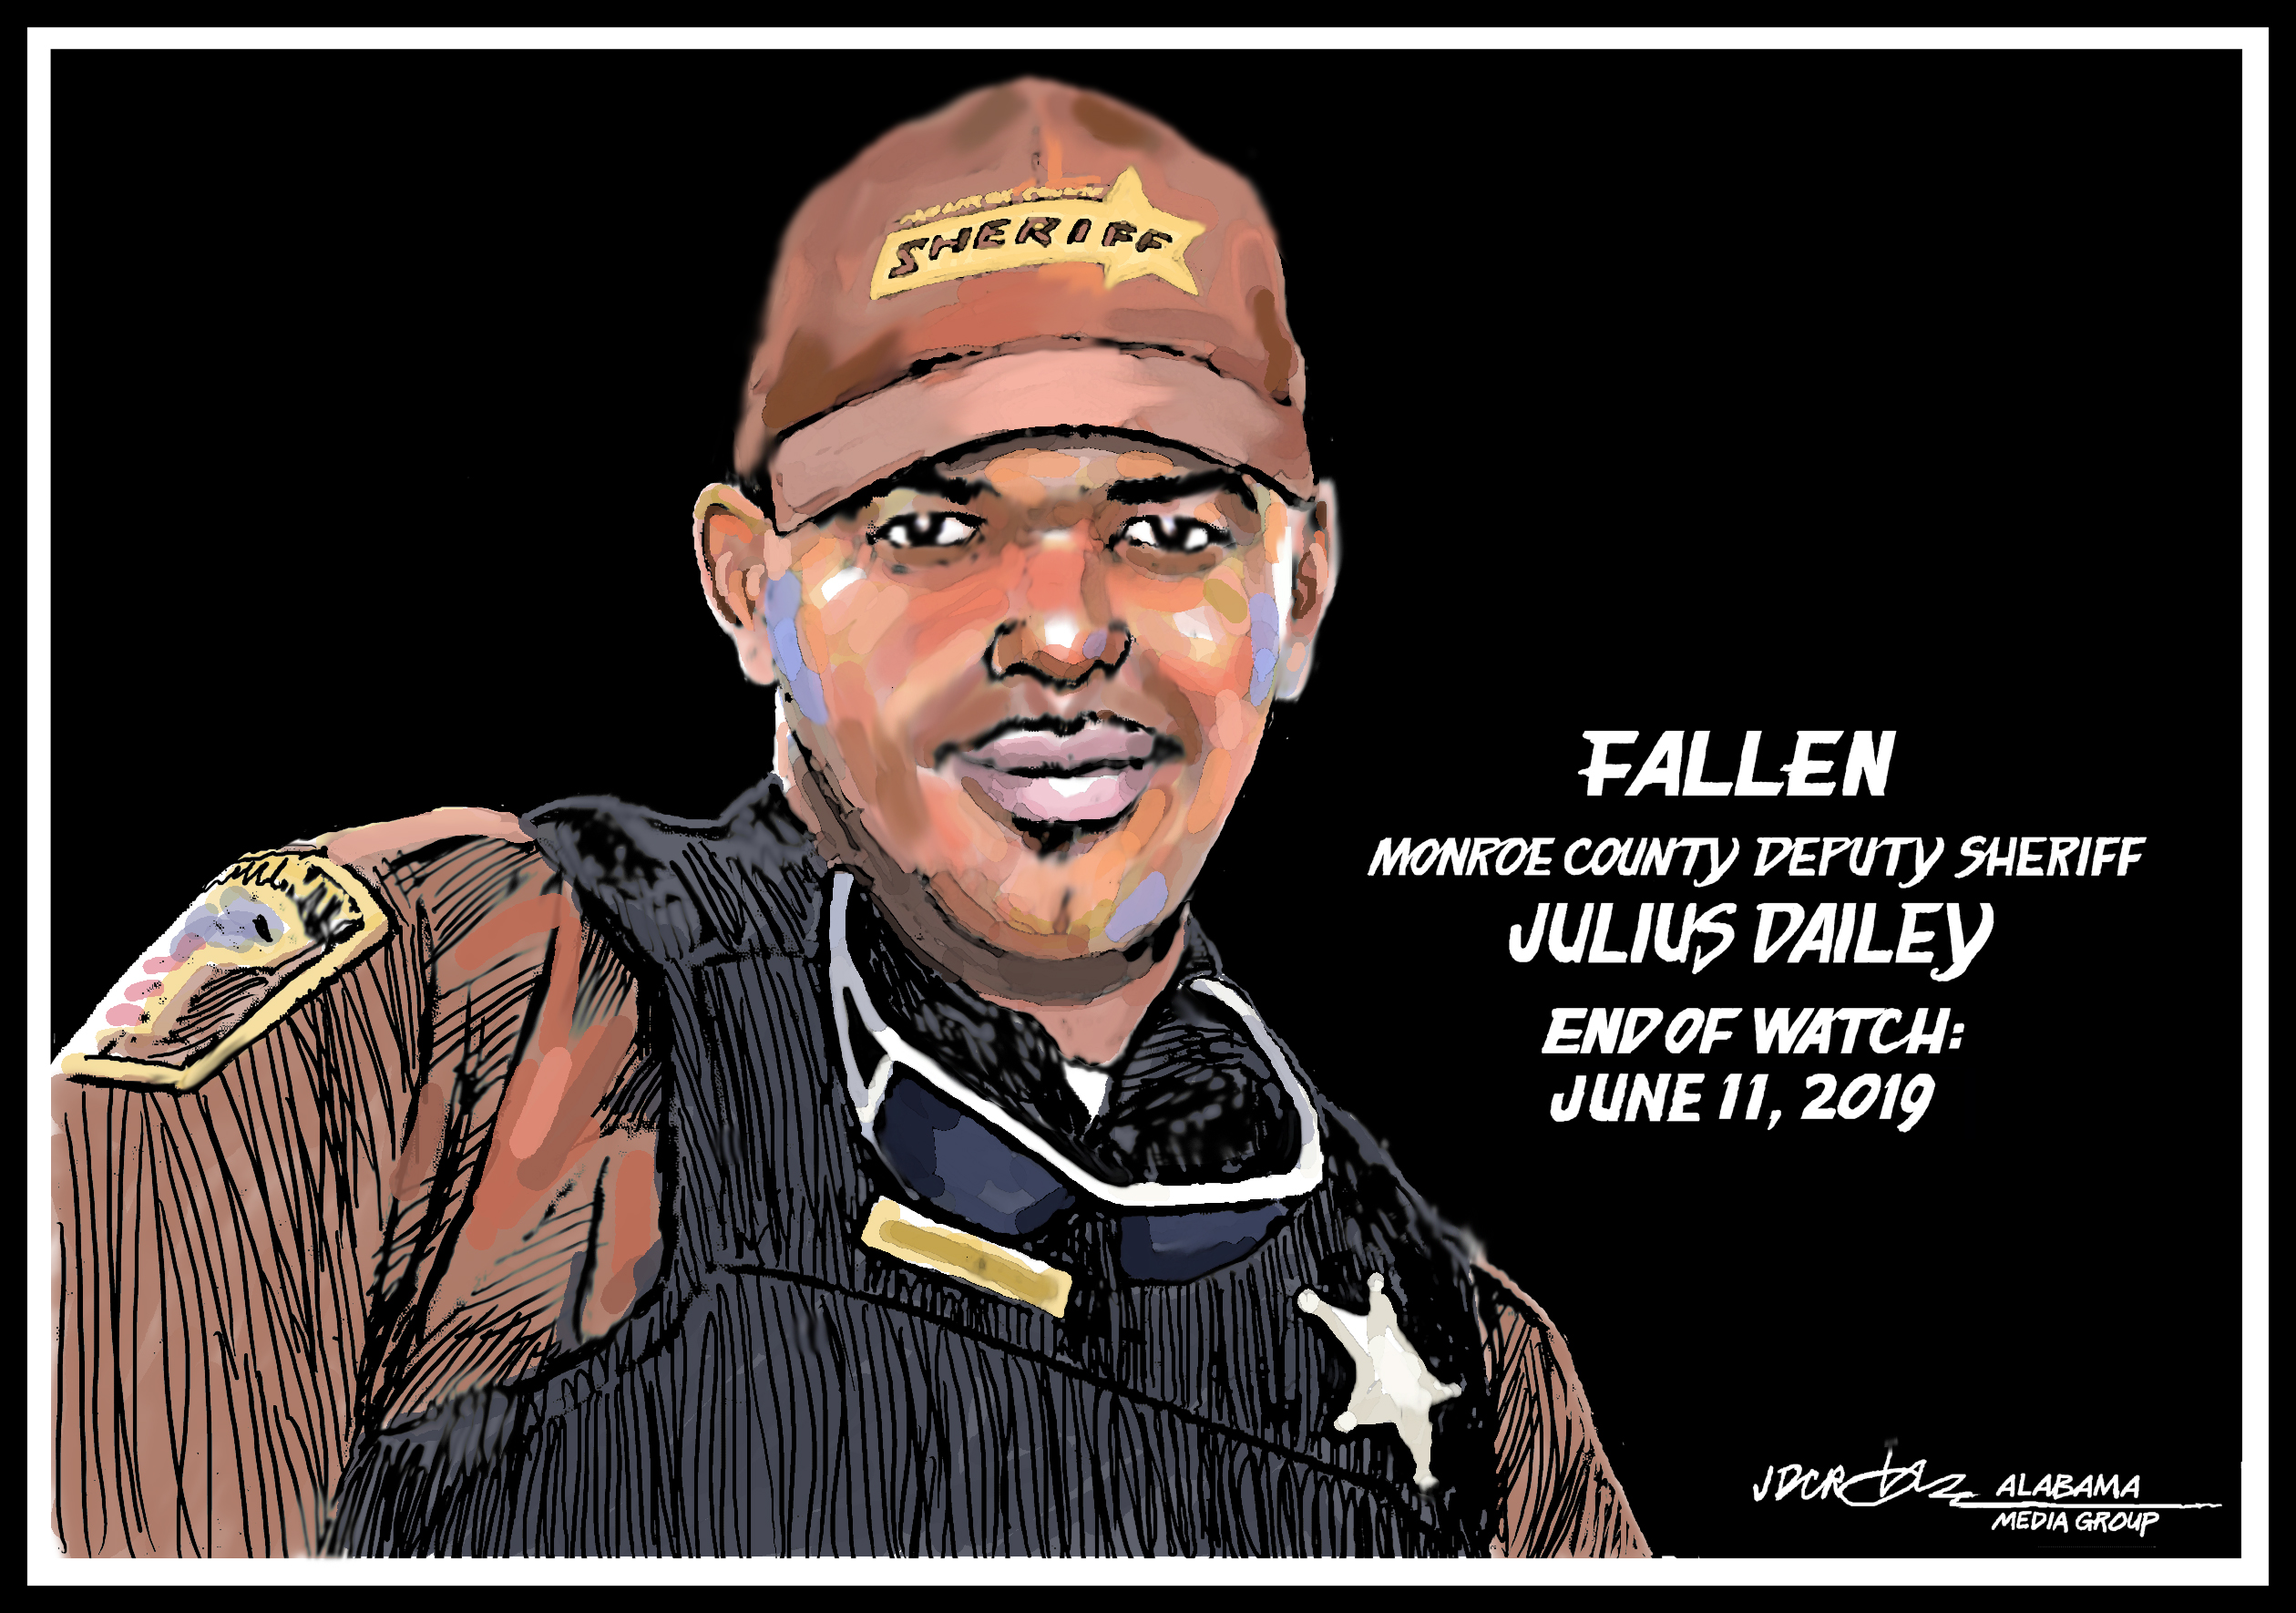 Julius Dailey: Tribute to Monroe County deputy sheriff - al com